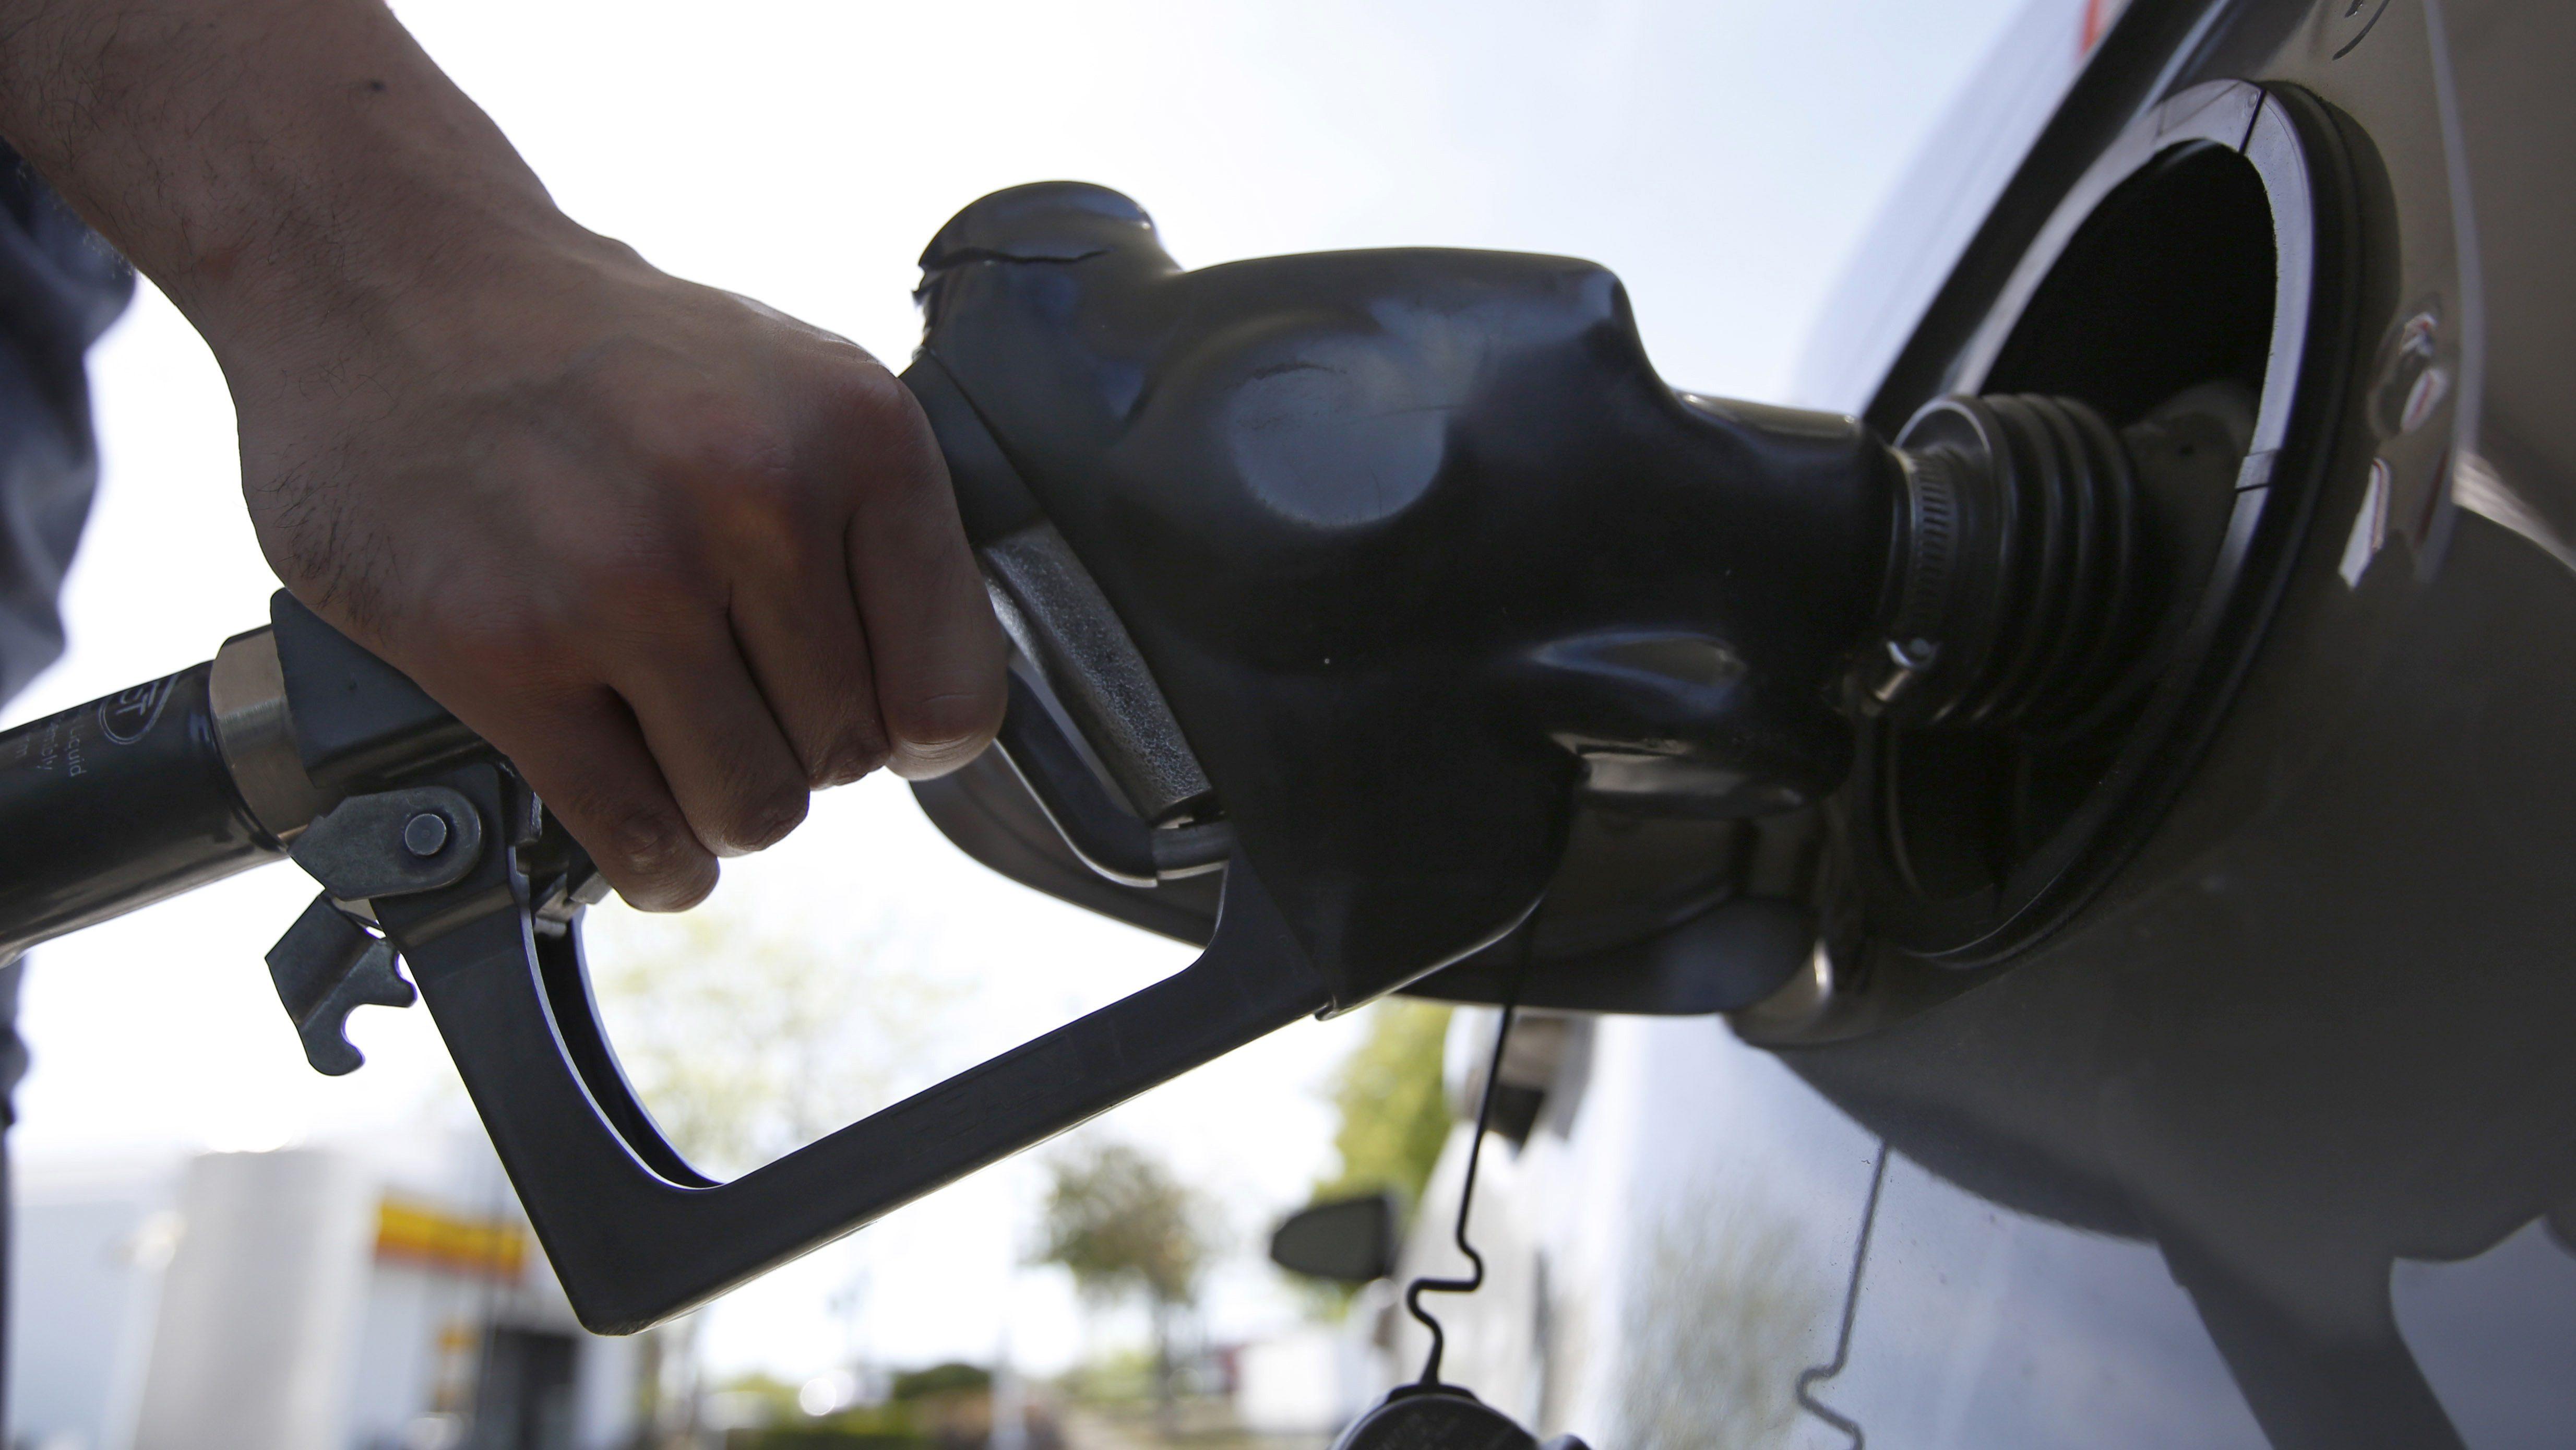 A motorist puts gas in his car